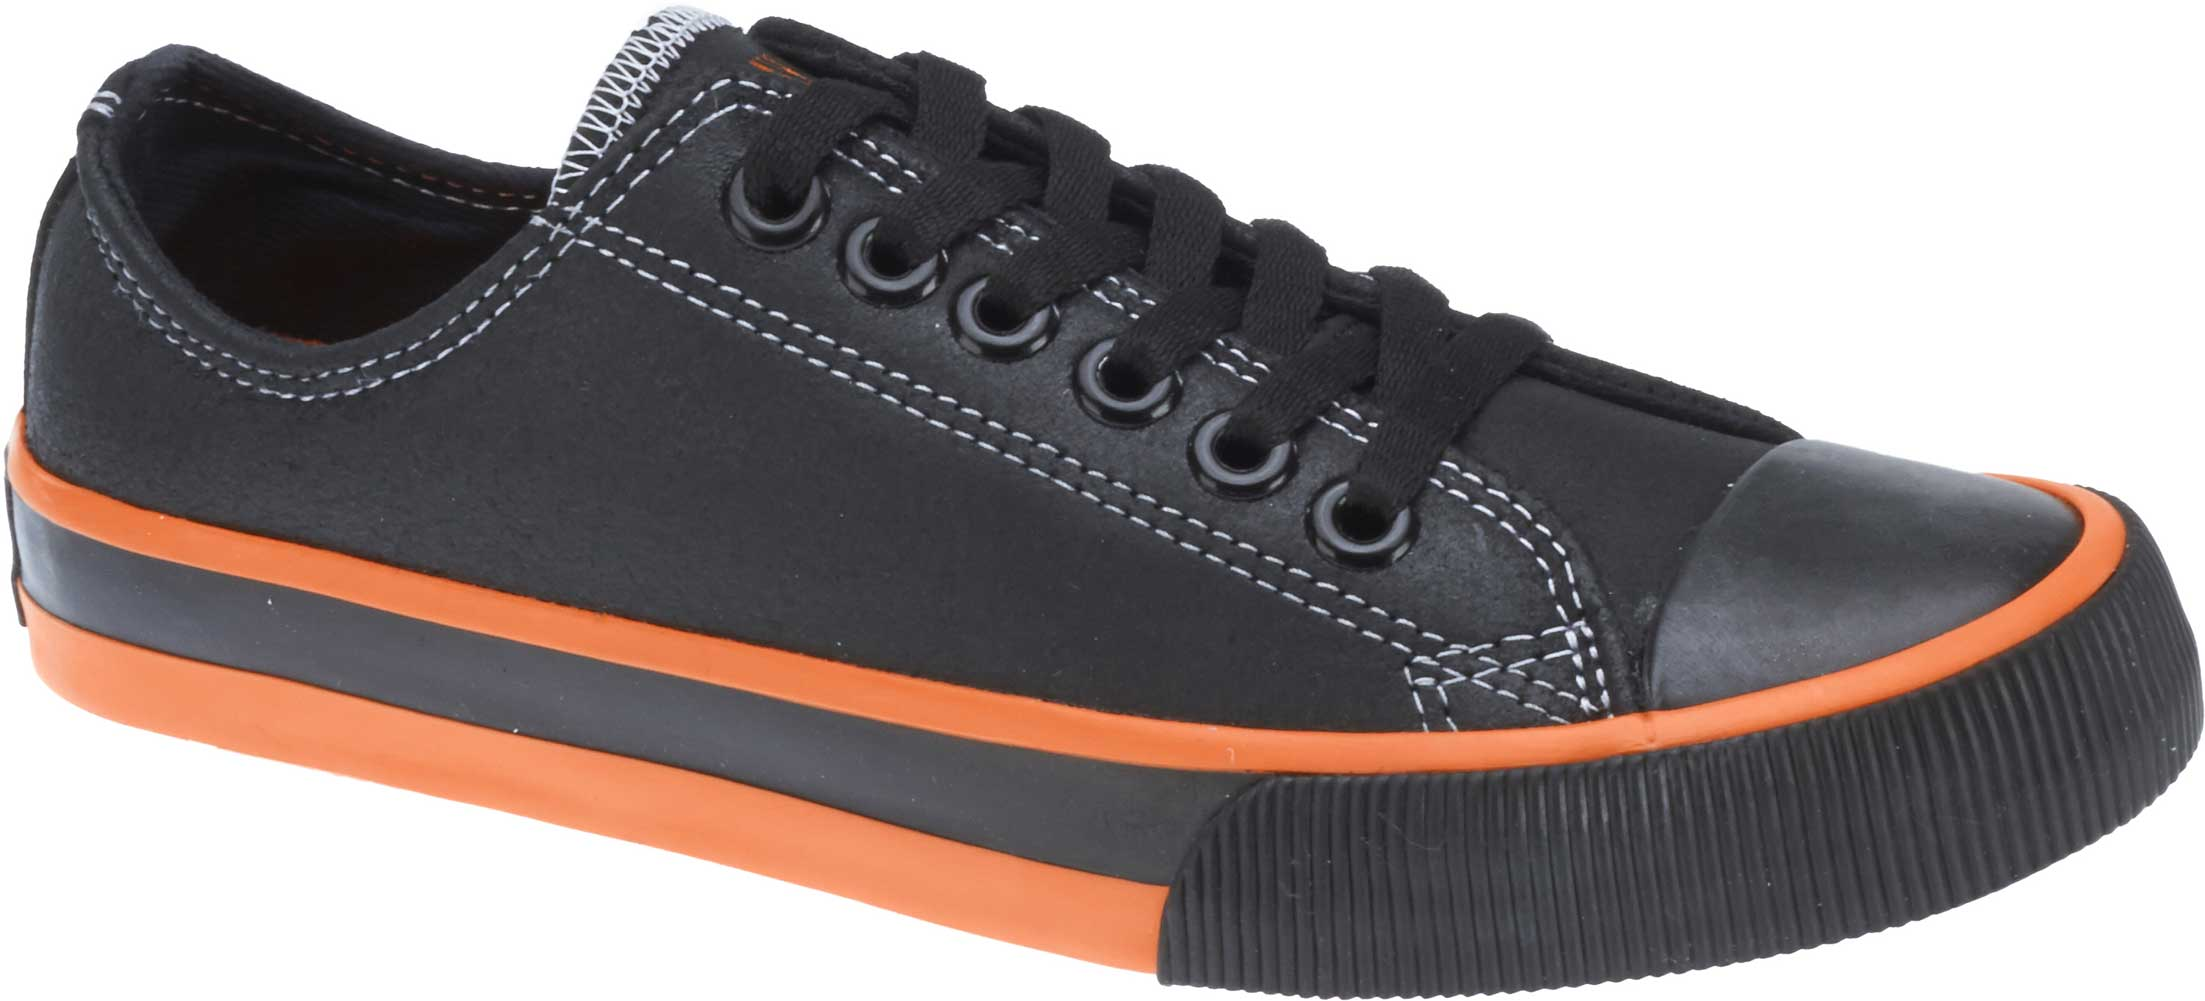 Harley-Davidson Mens Roarke Casual Shoe